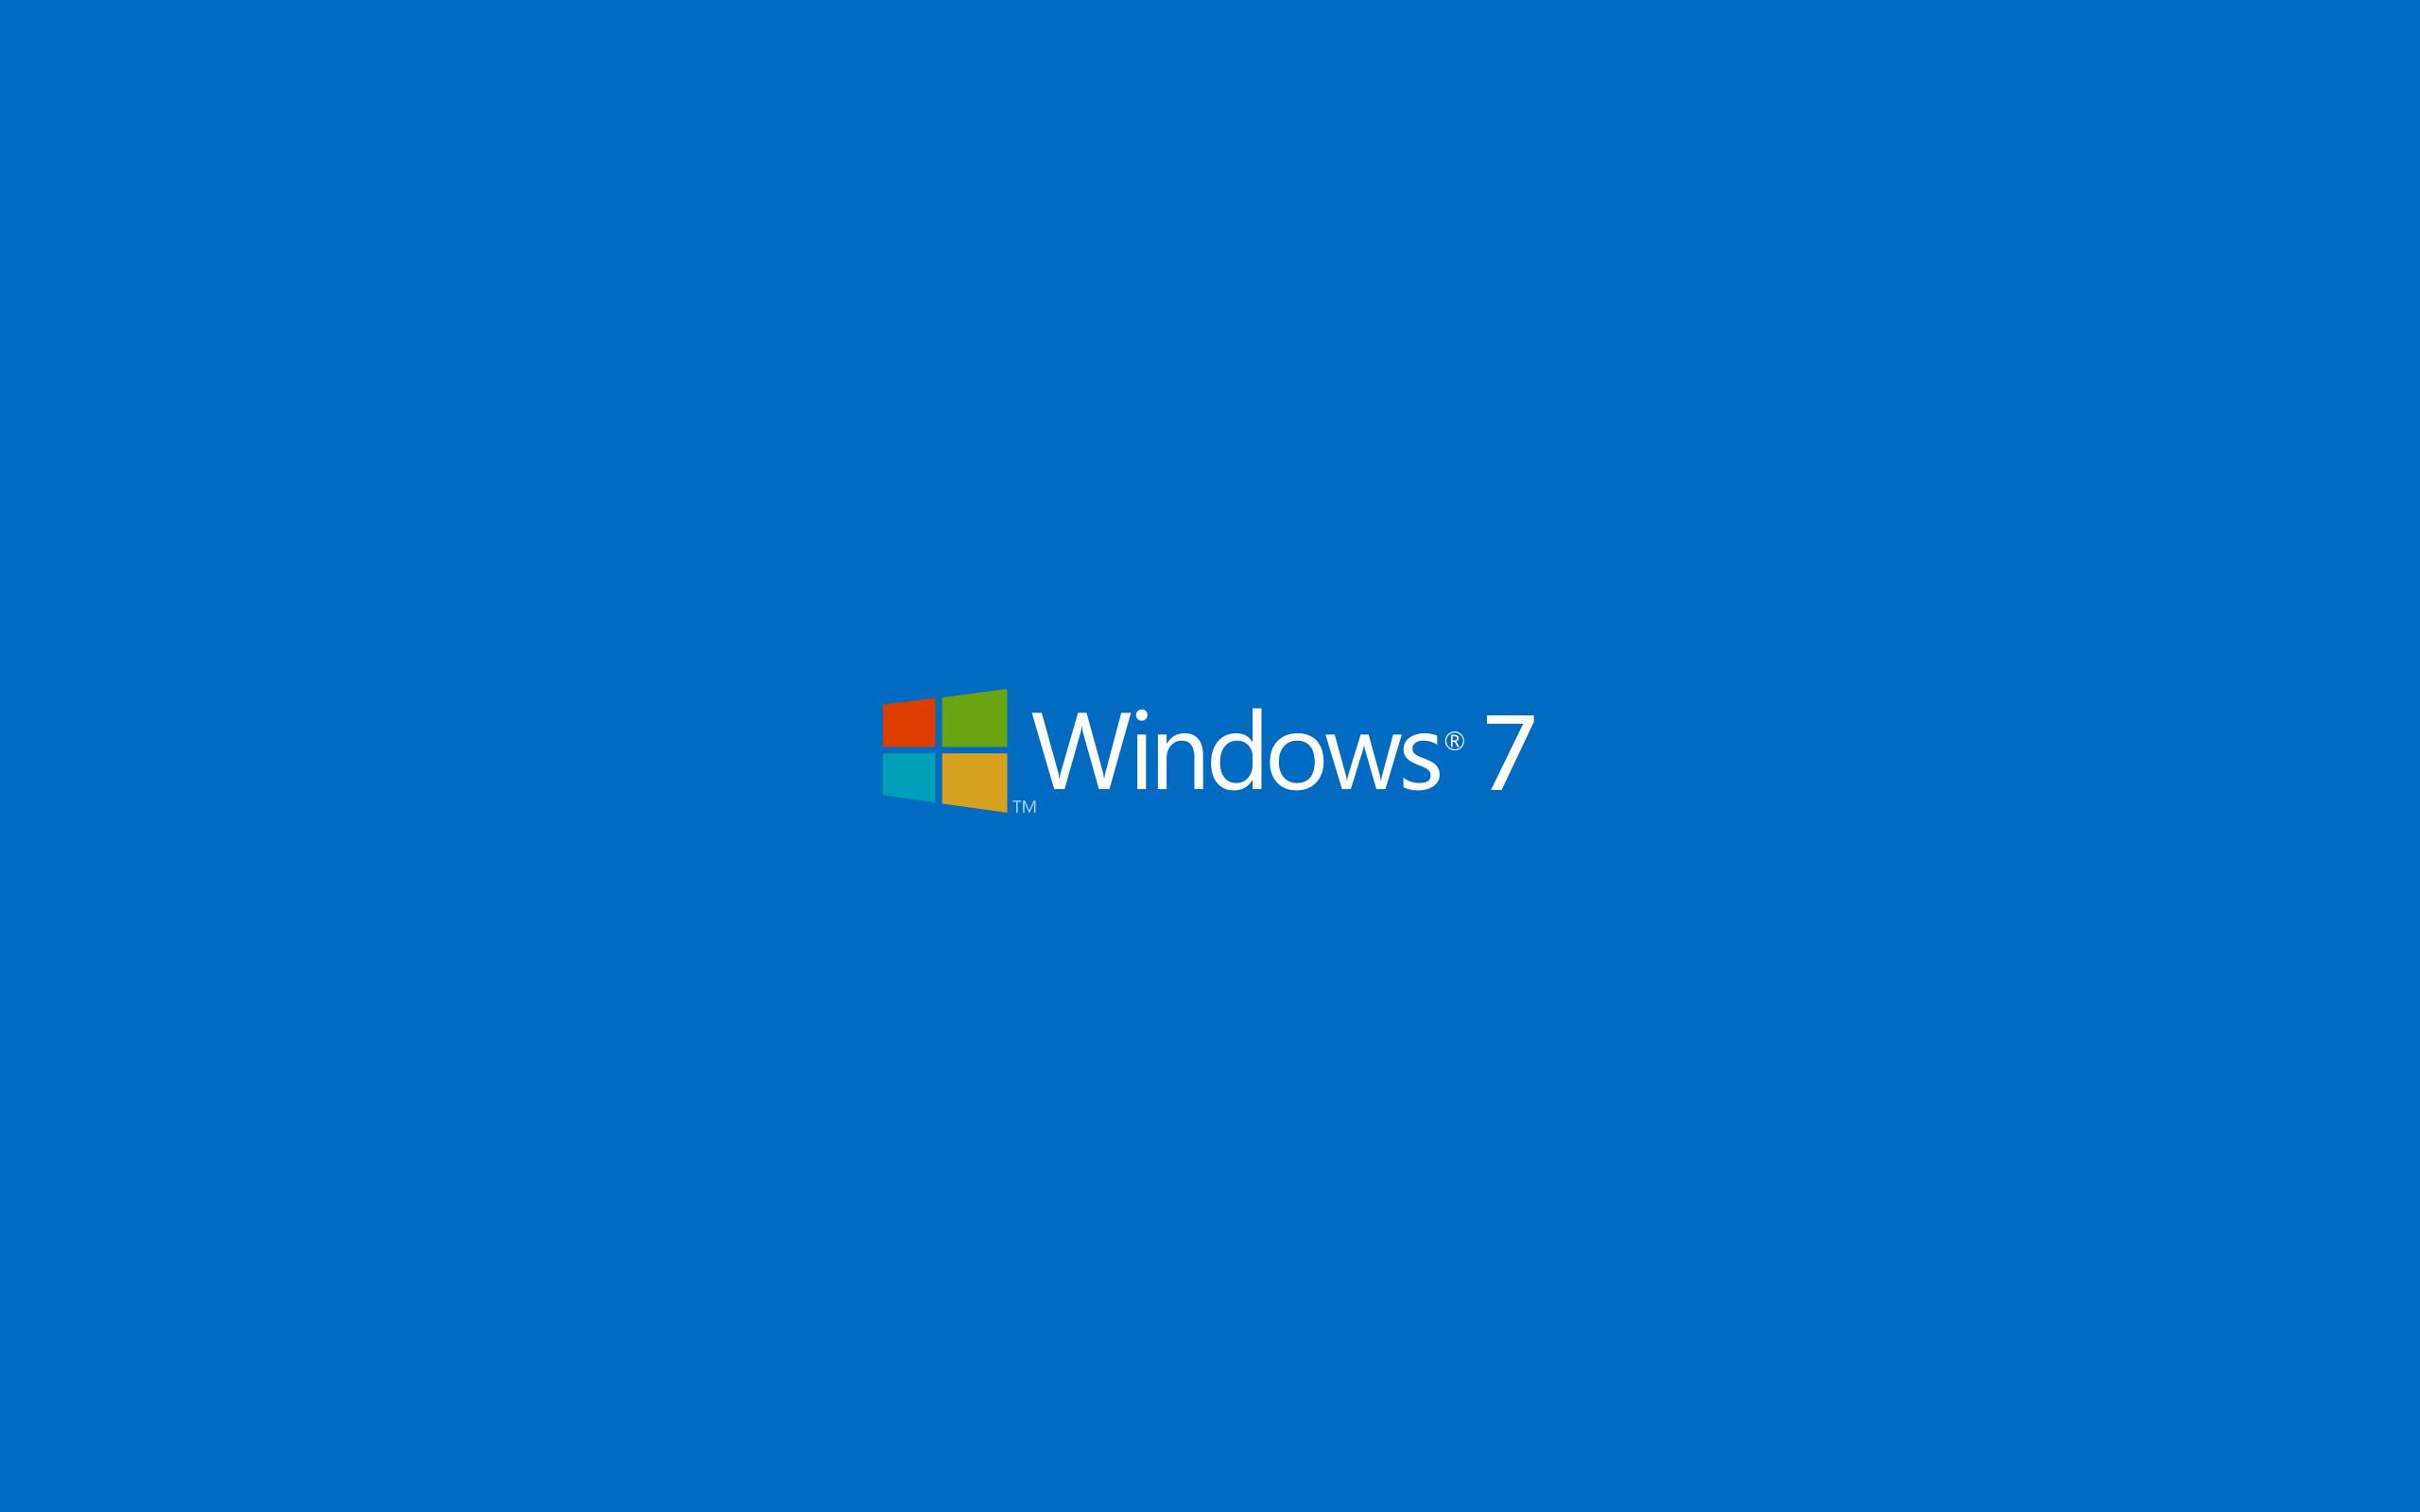 Sfondi Sfondo Semplice Minimalismo Testo Logo Microsoft